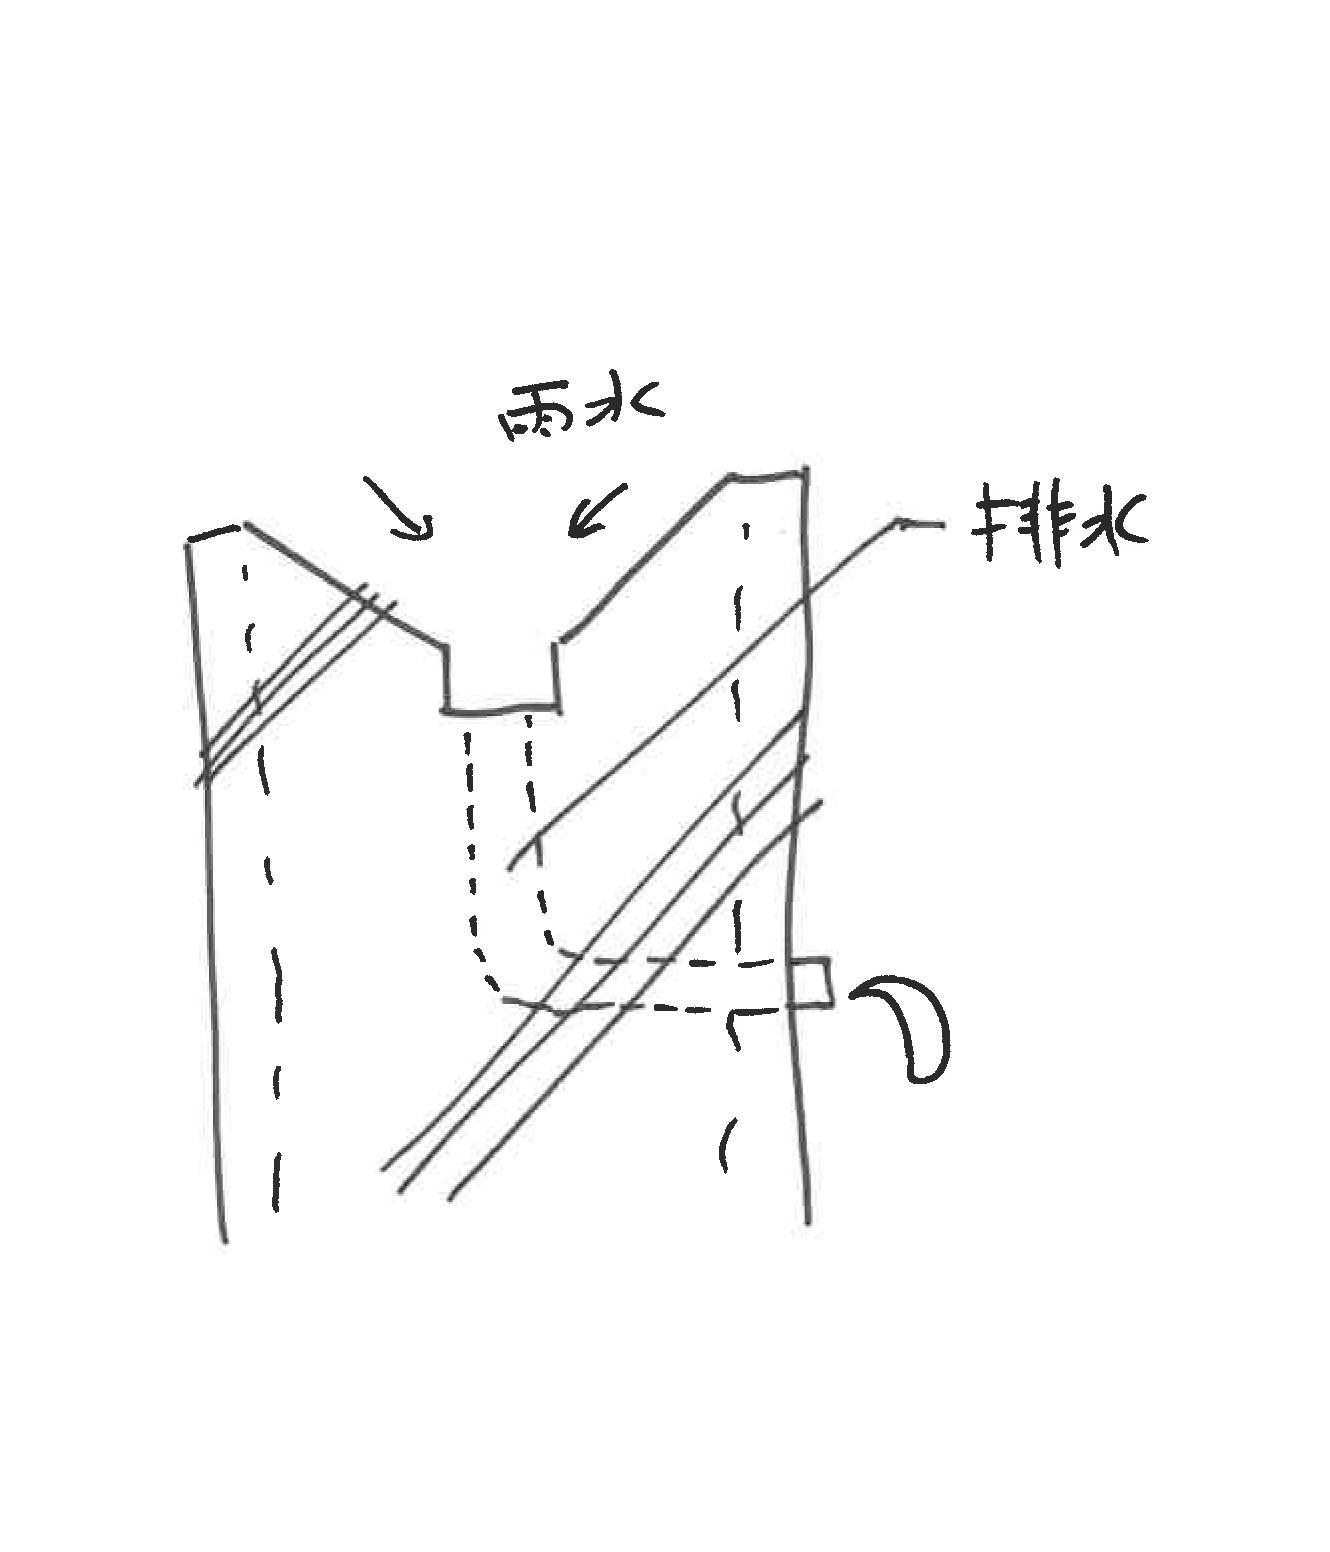 RC壁内排水 汚れ防止